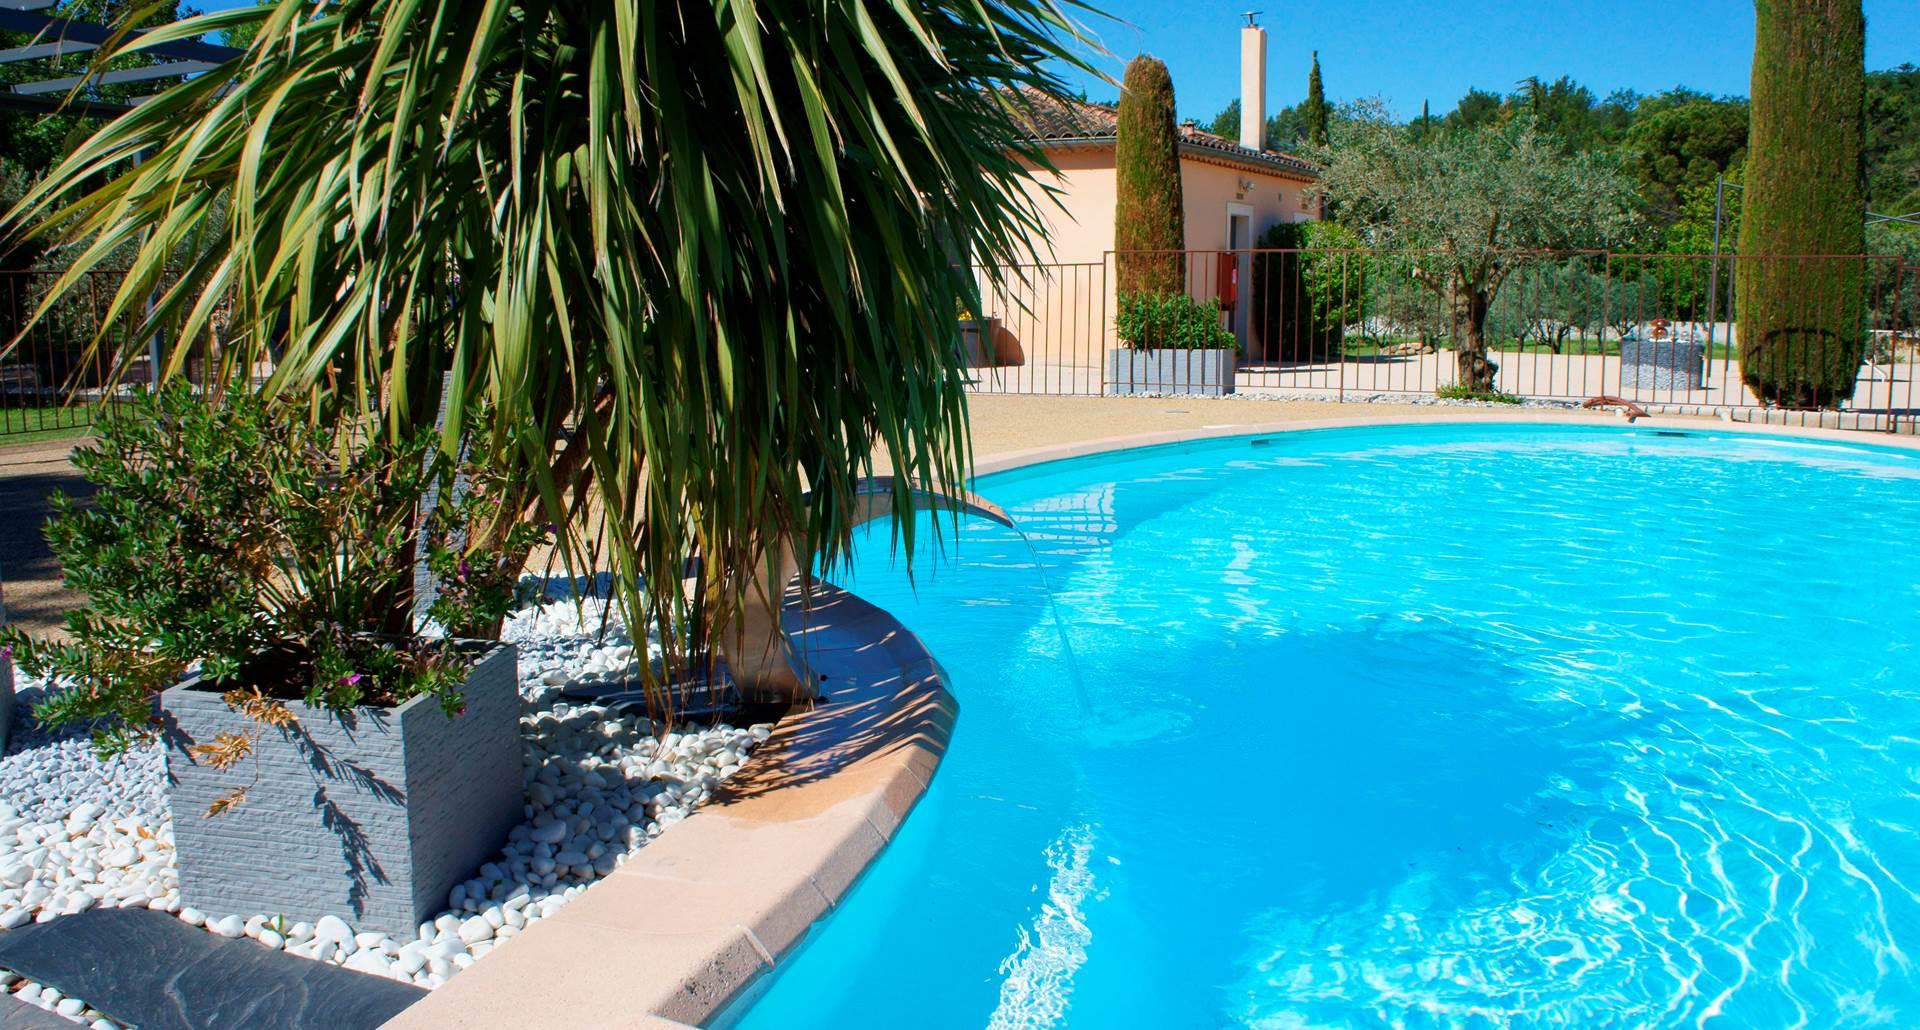 Piscine hotel residence les peupliers loriol du comtat provence